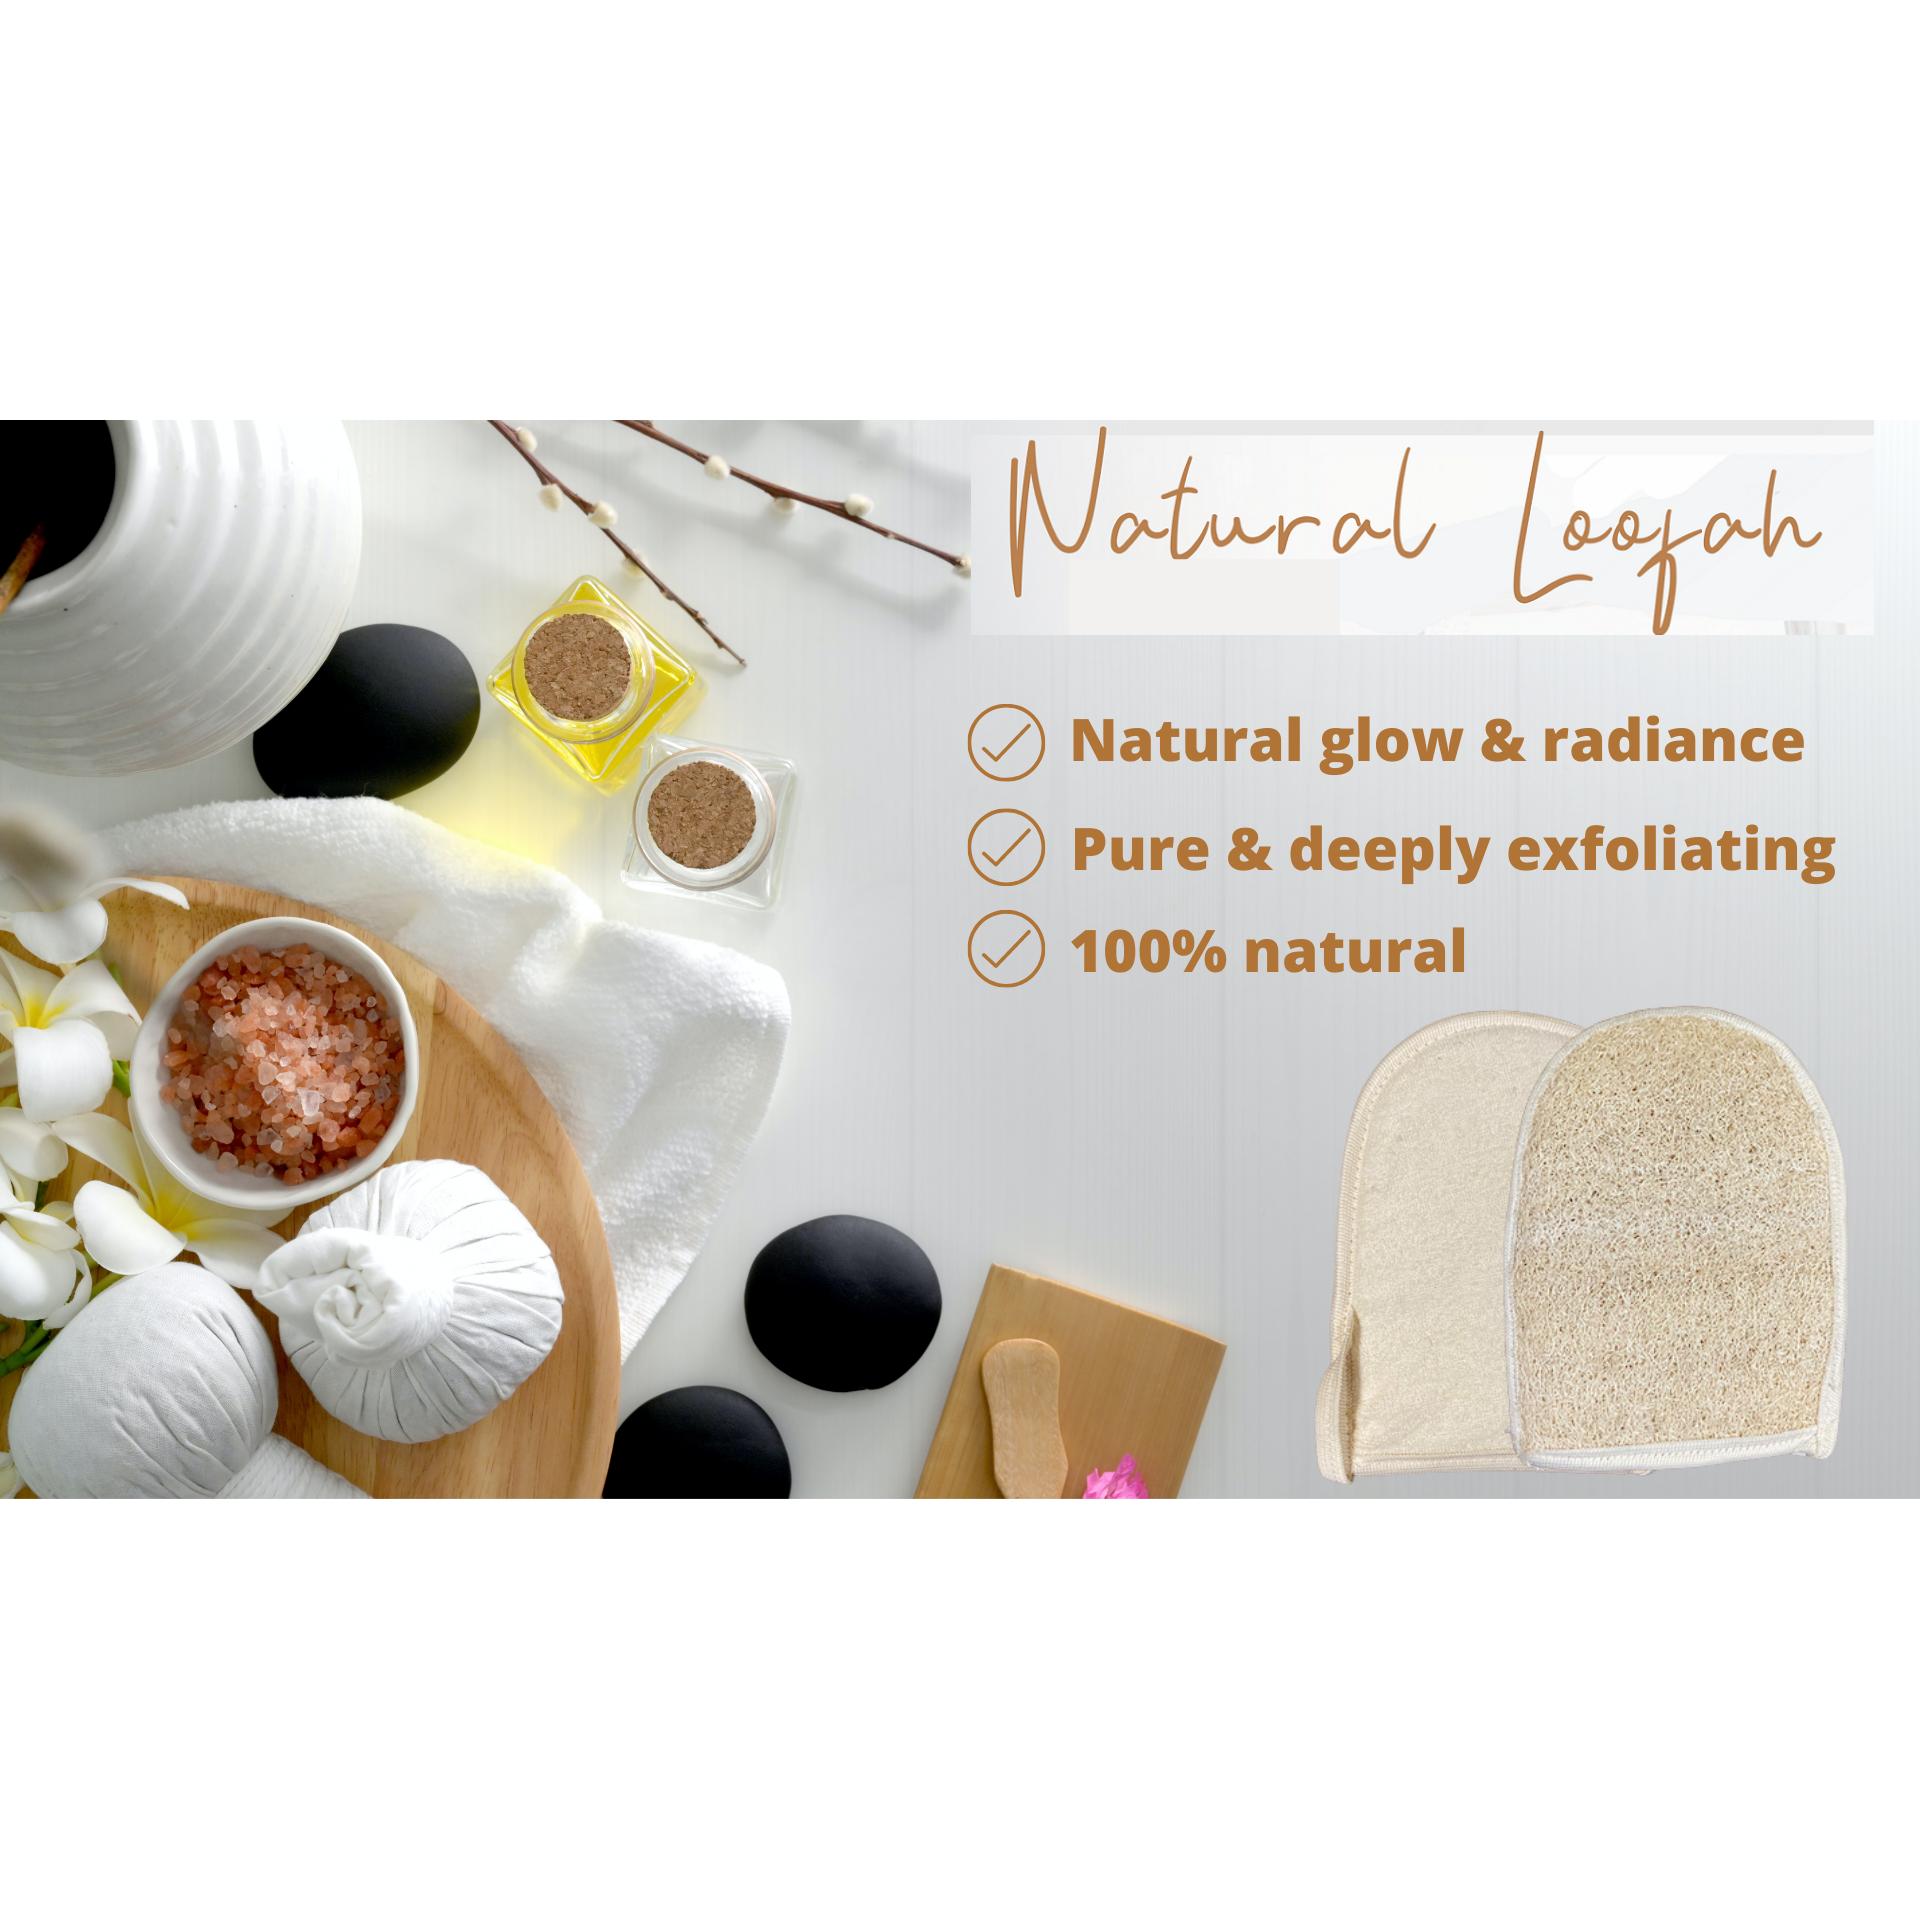 body-scrubber-loofah-sponge-exfoliate-skin-care with discount code